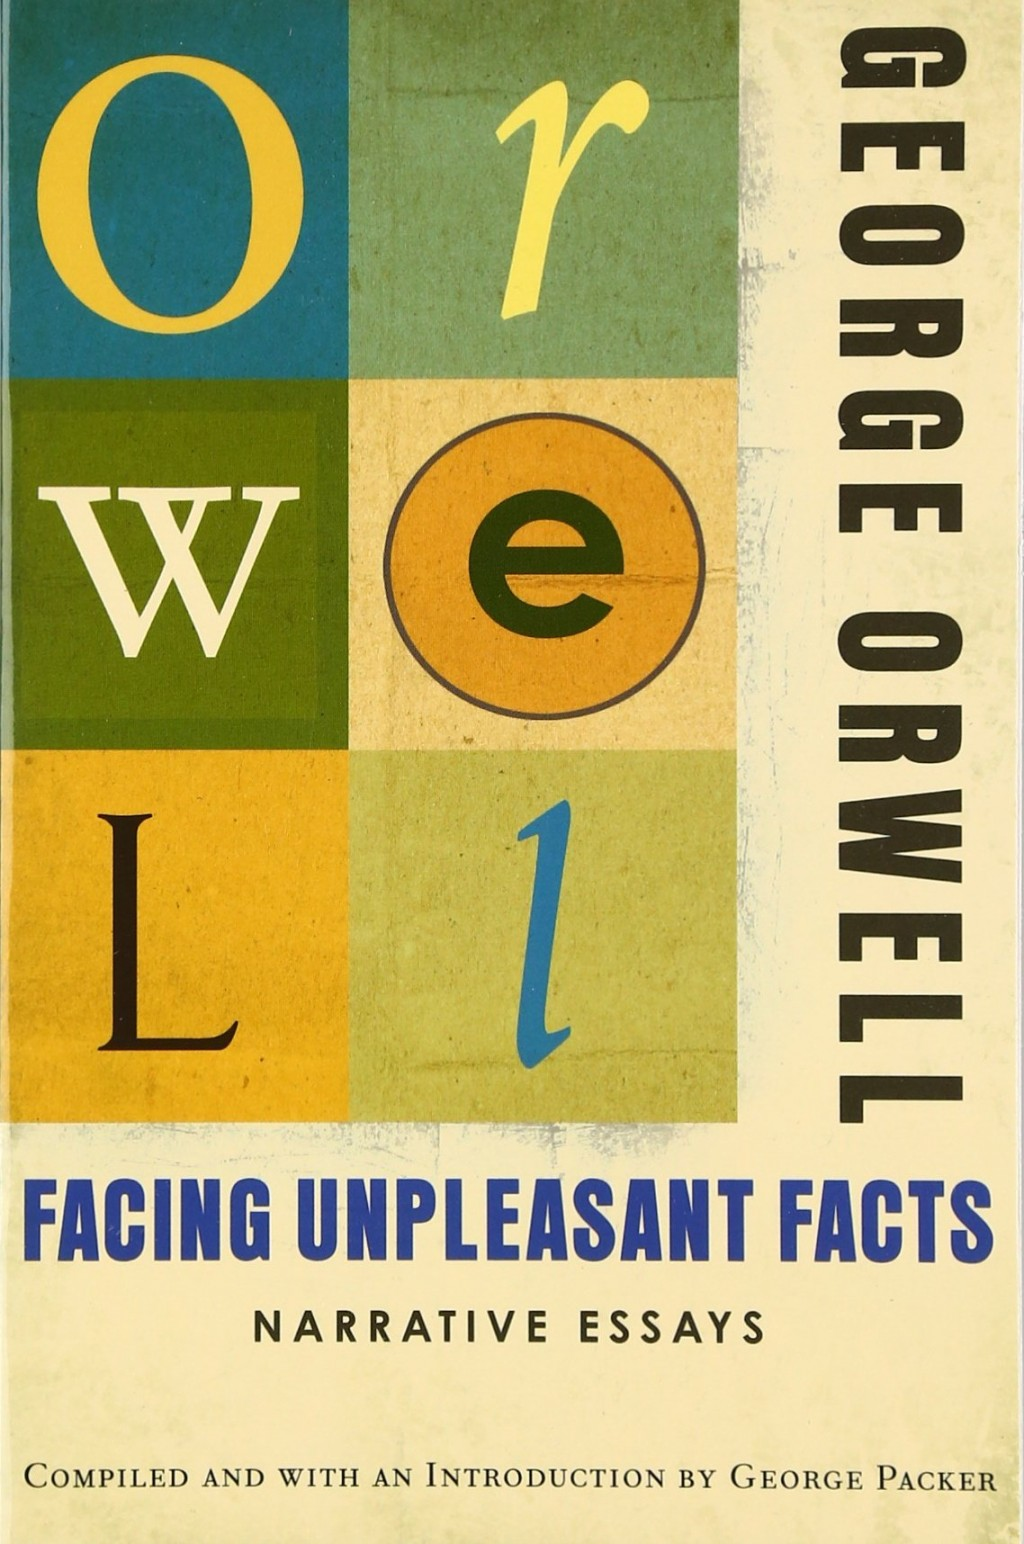 023 Essay Example 817mi1ypesl George Orwell Frightening Essays Everyman's Library Summary Bookshop Memories Large